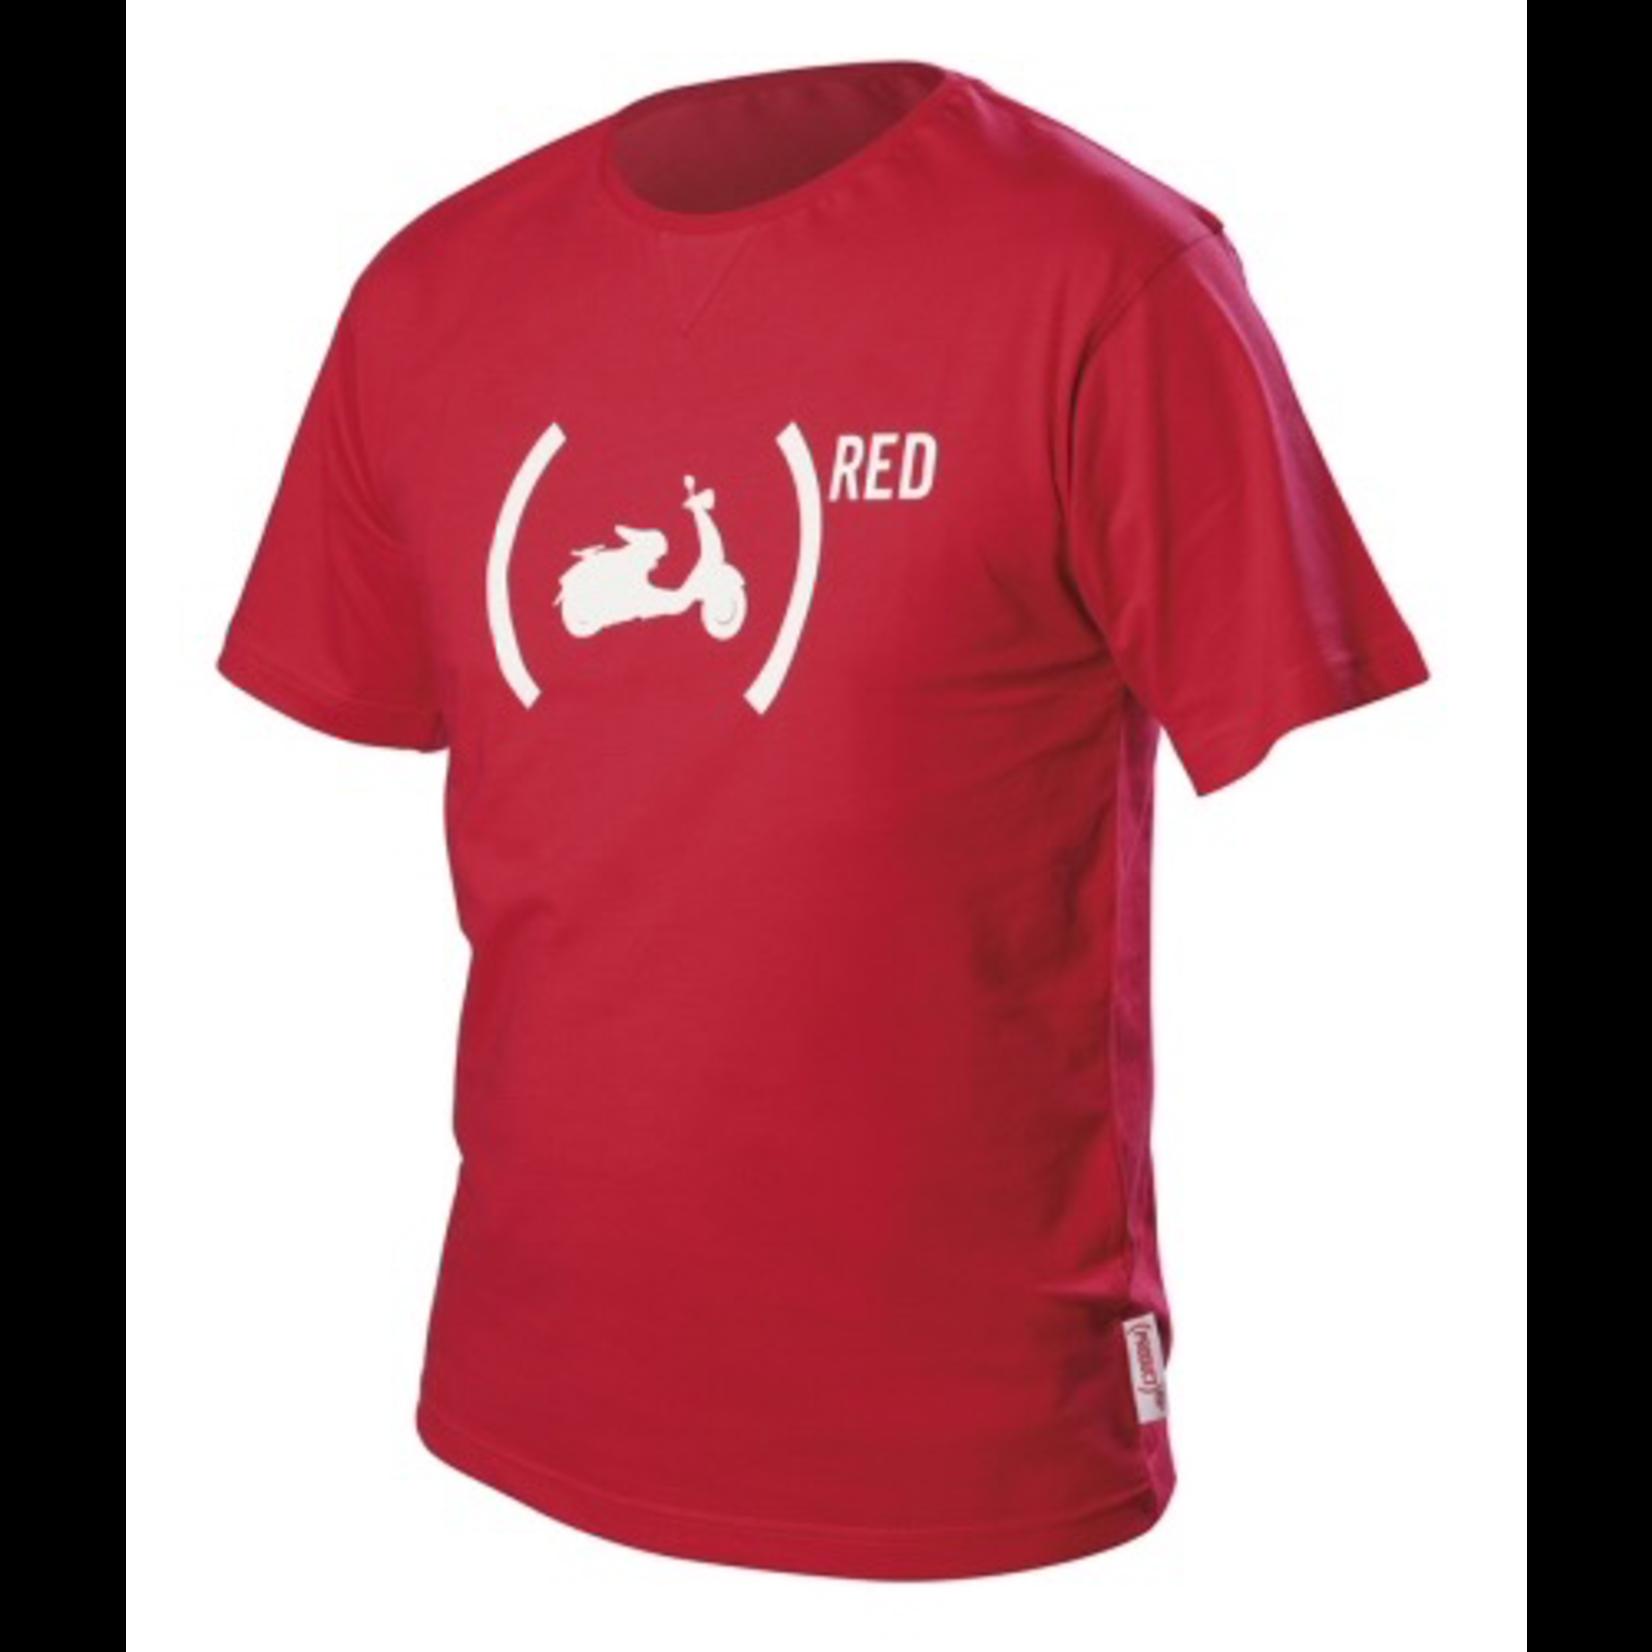 Apparel T-Shirt, Men's (Unisex) Vespa (RED)